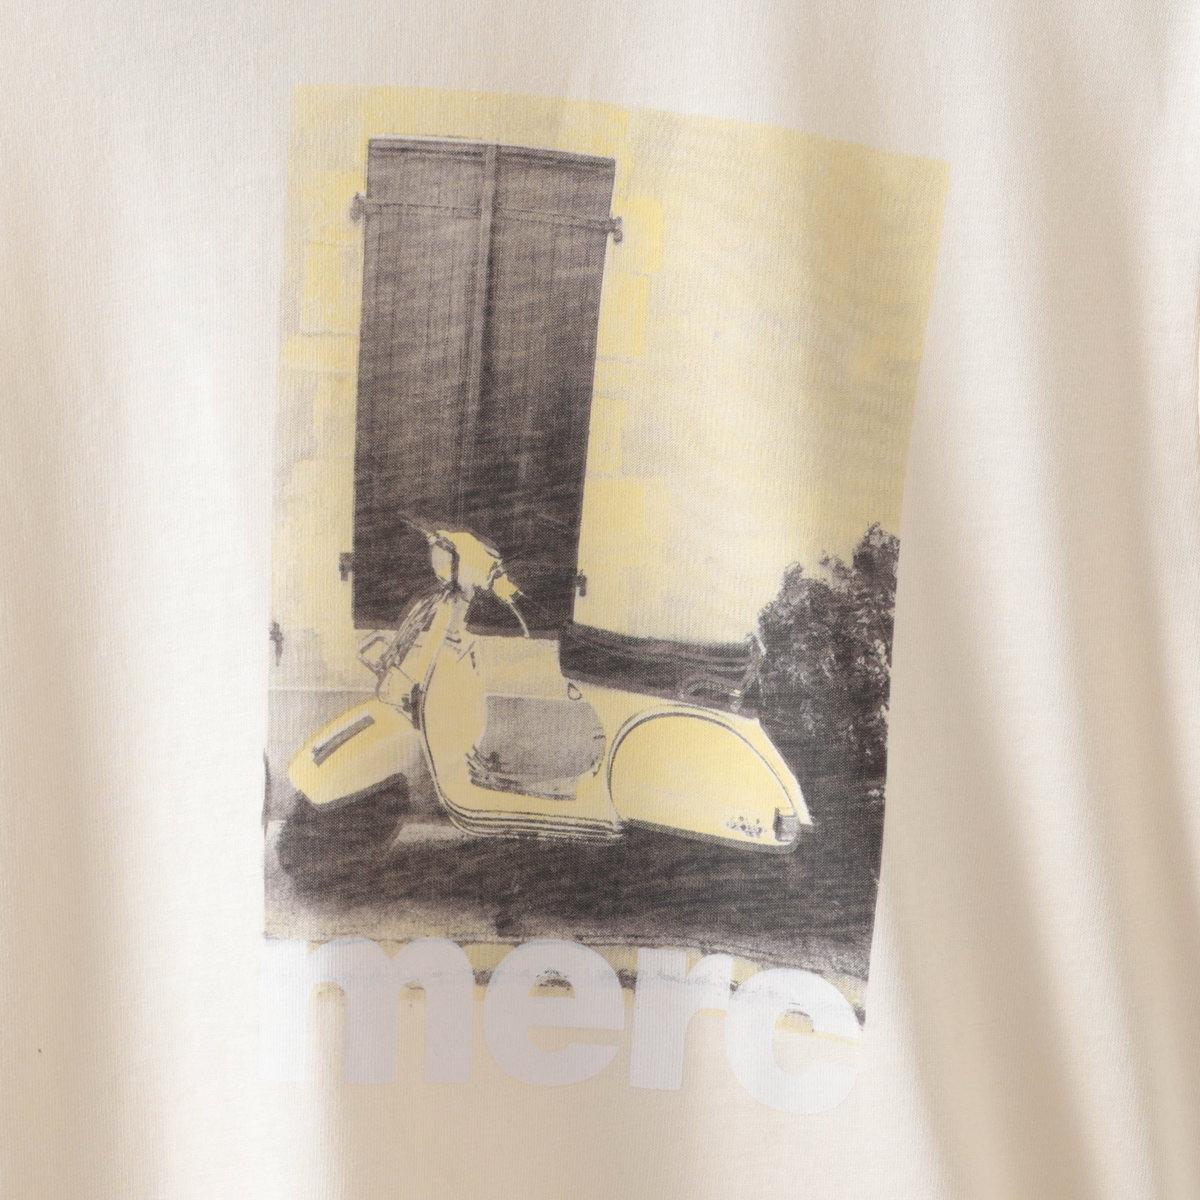 Tシャツ スクータープリント アイボリー モッズファッション メンズ Merc London メルクロンドン